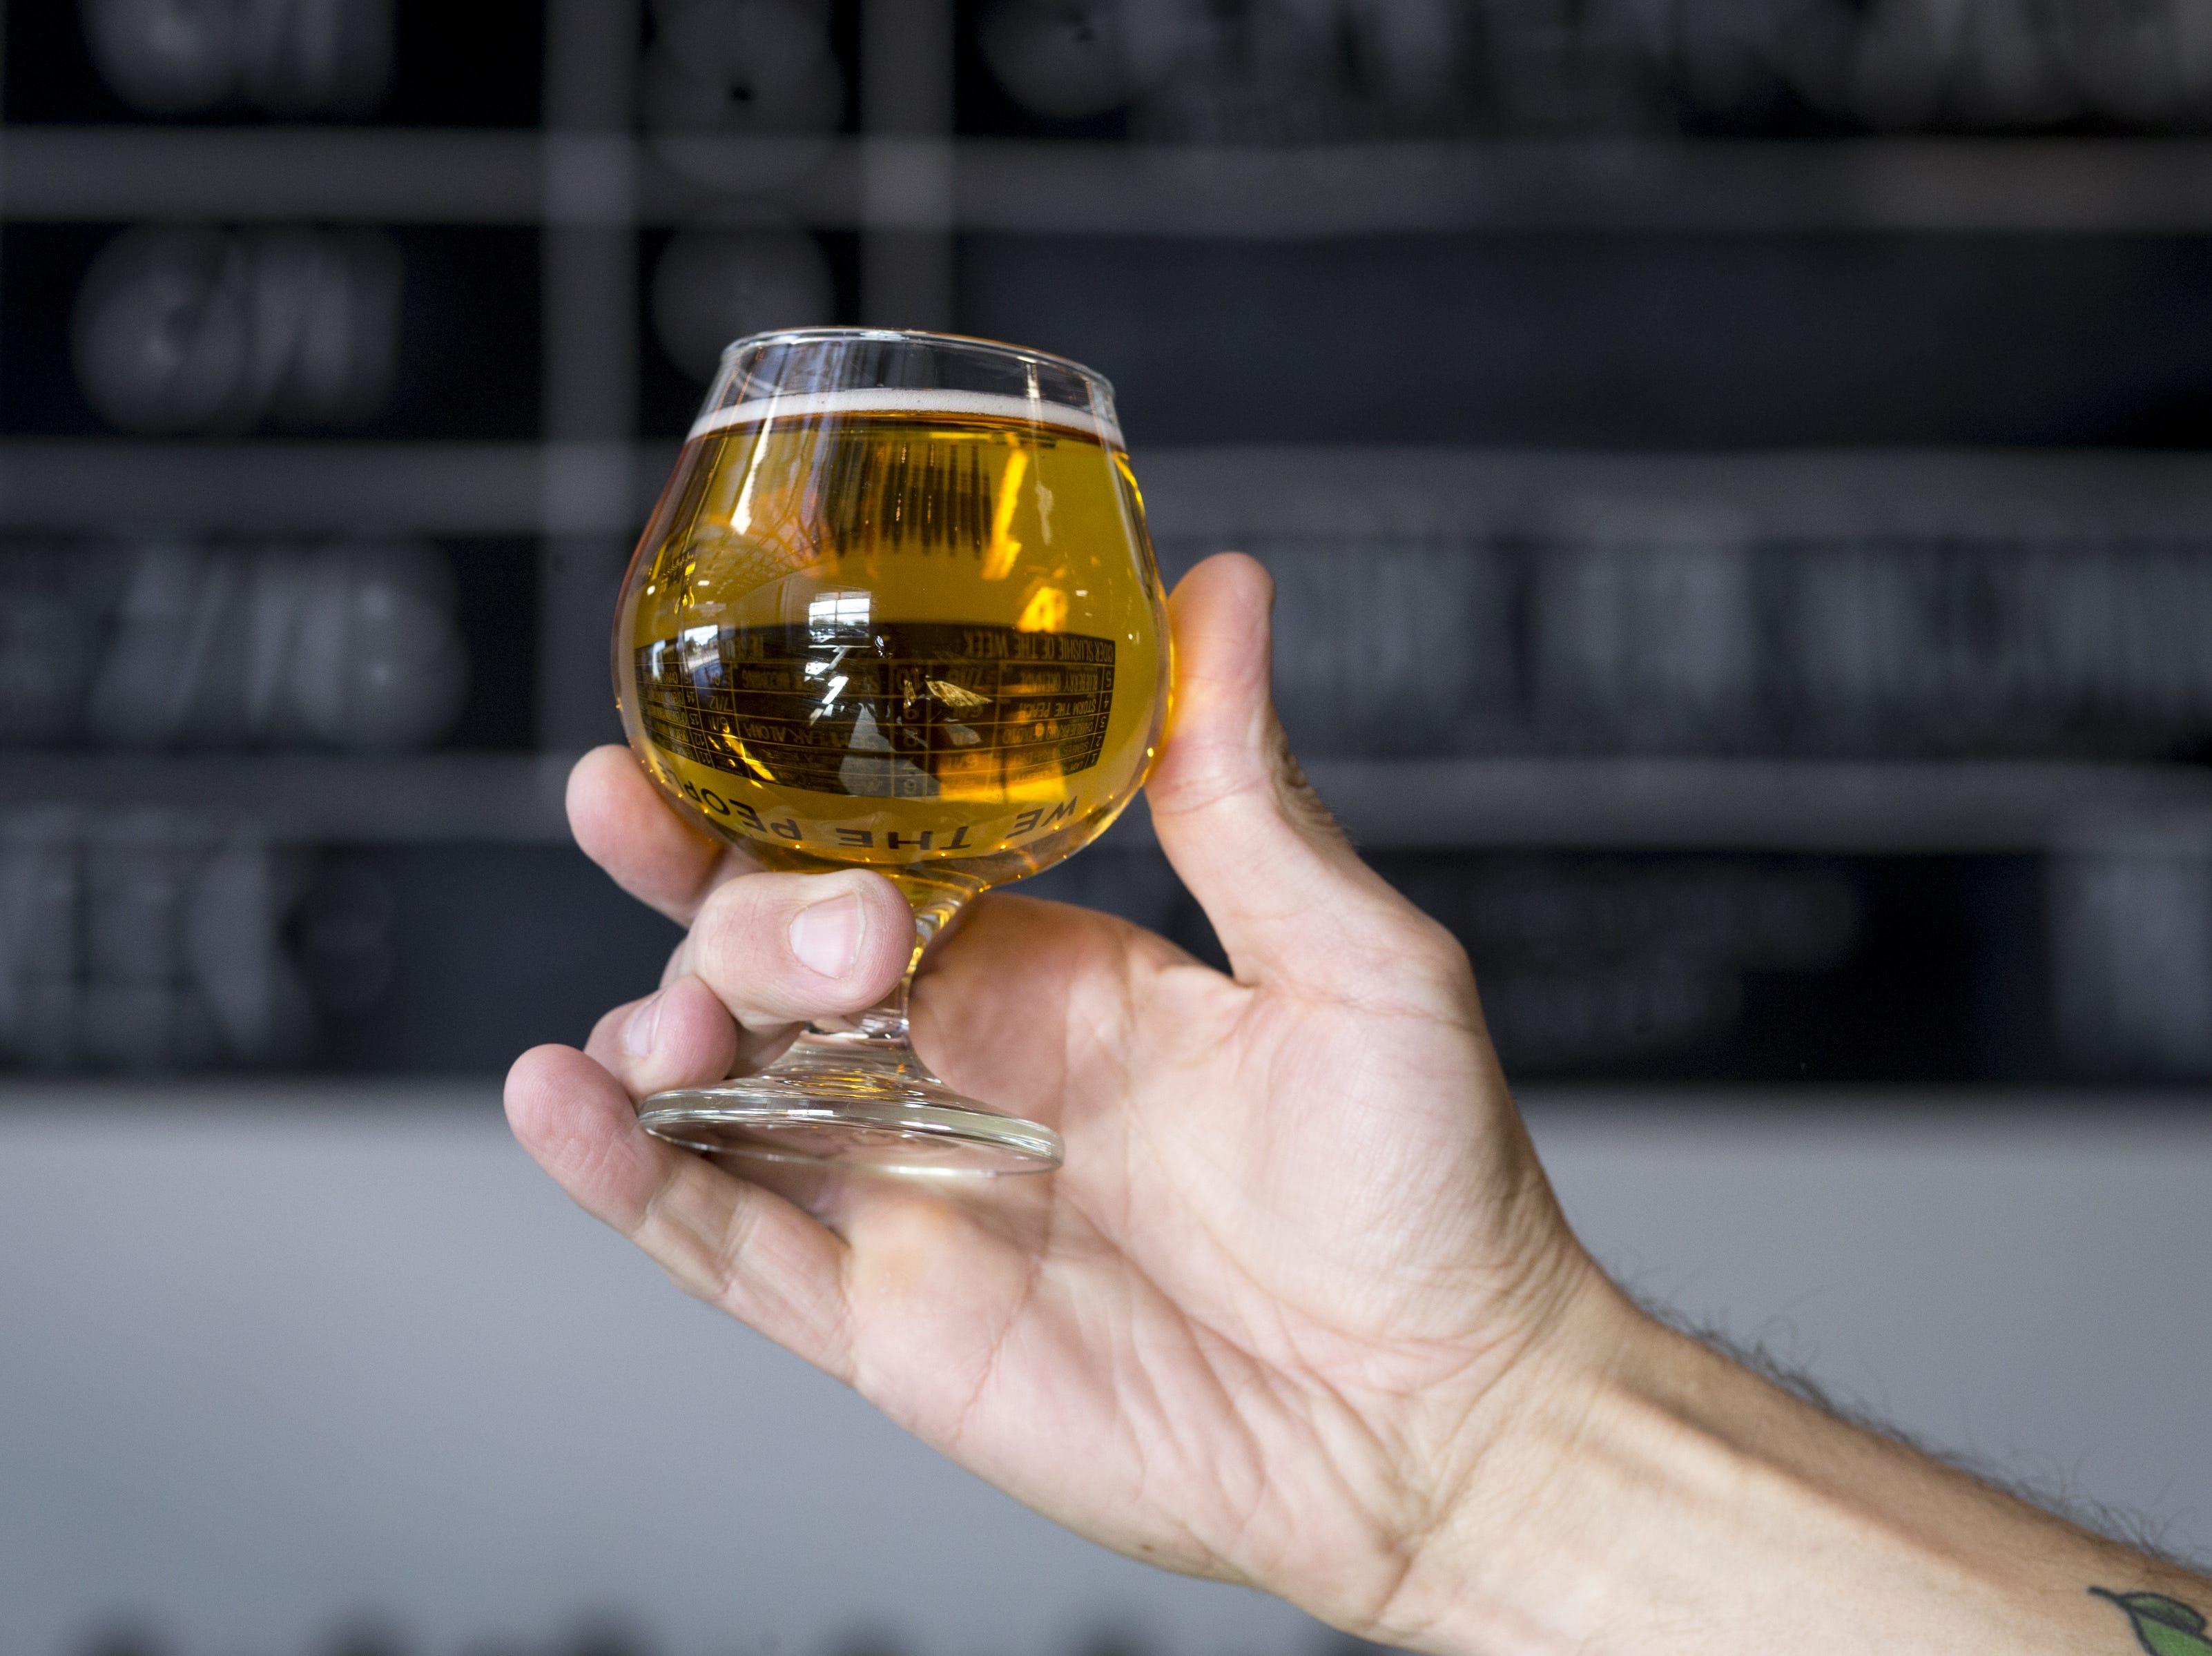 Josh Duren holds a cider, Dec. 5, 2018, at Cider Corps, 31 S. Robson, Mesa.